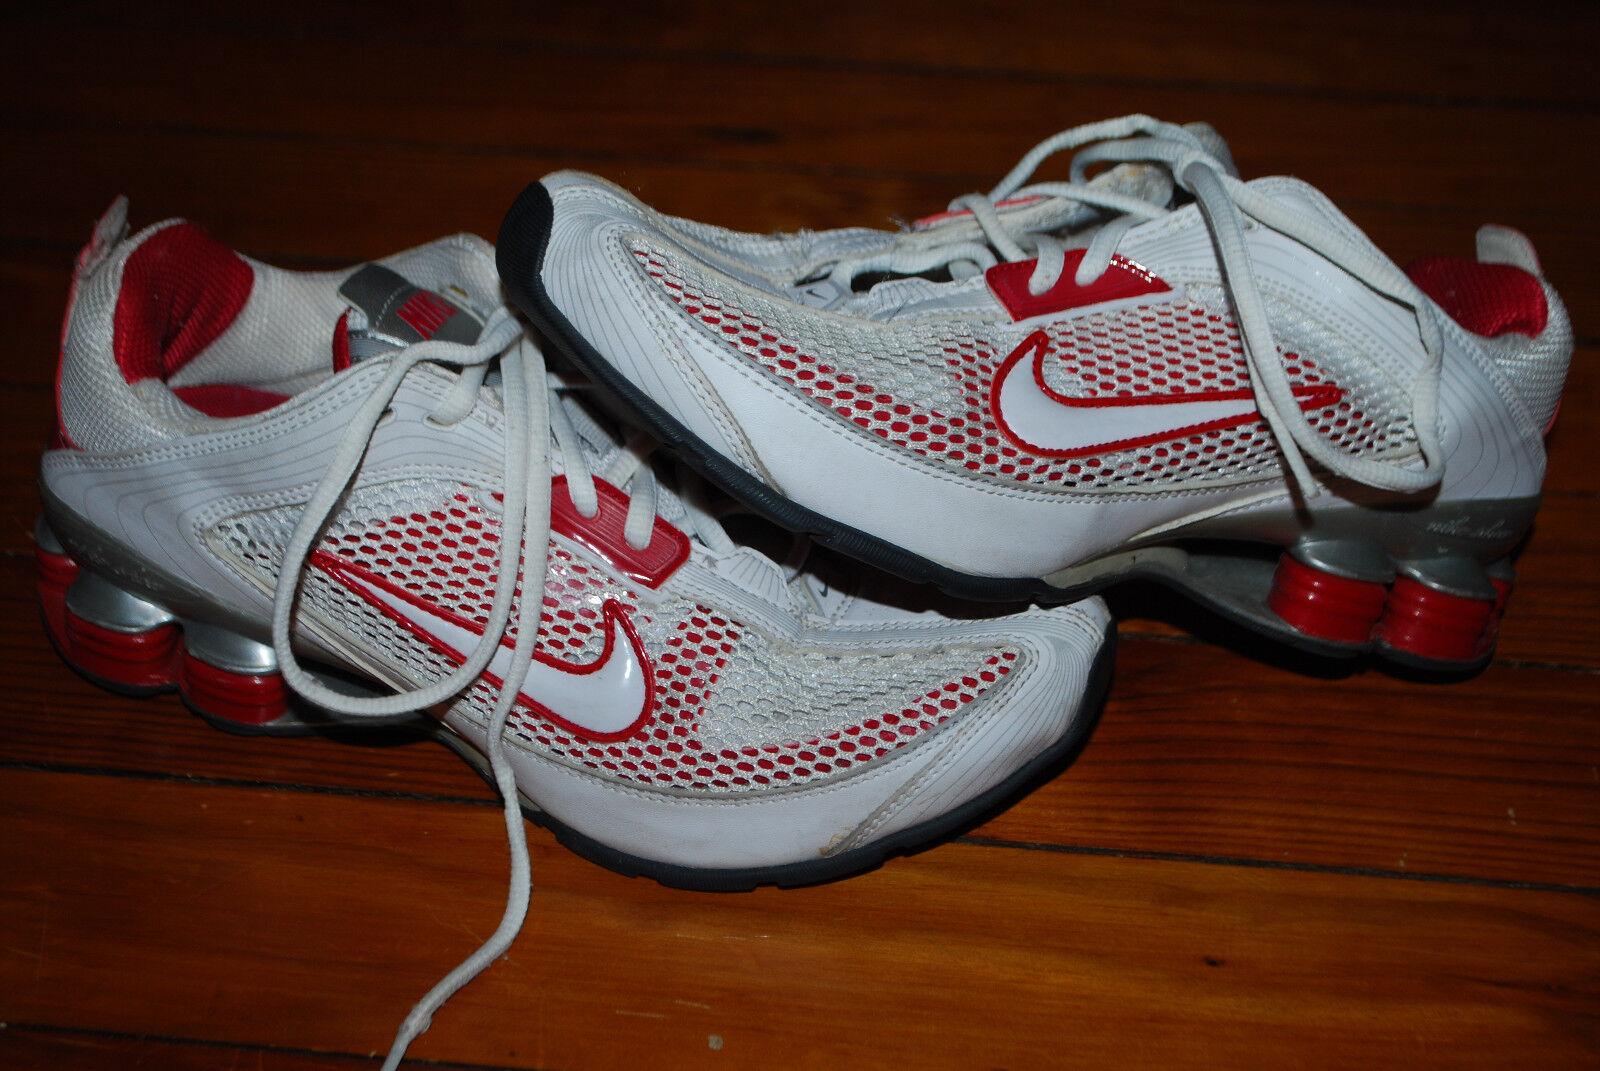 Women's Nike Shox Trainer Accomplish Running Sneaker (7.5)